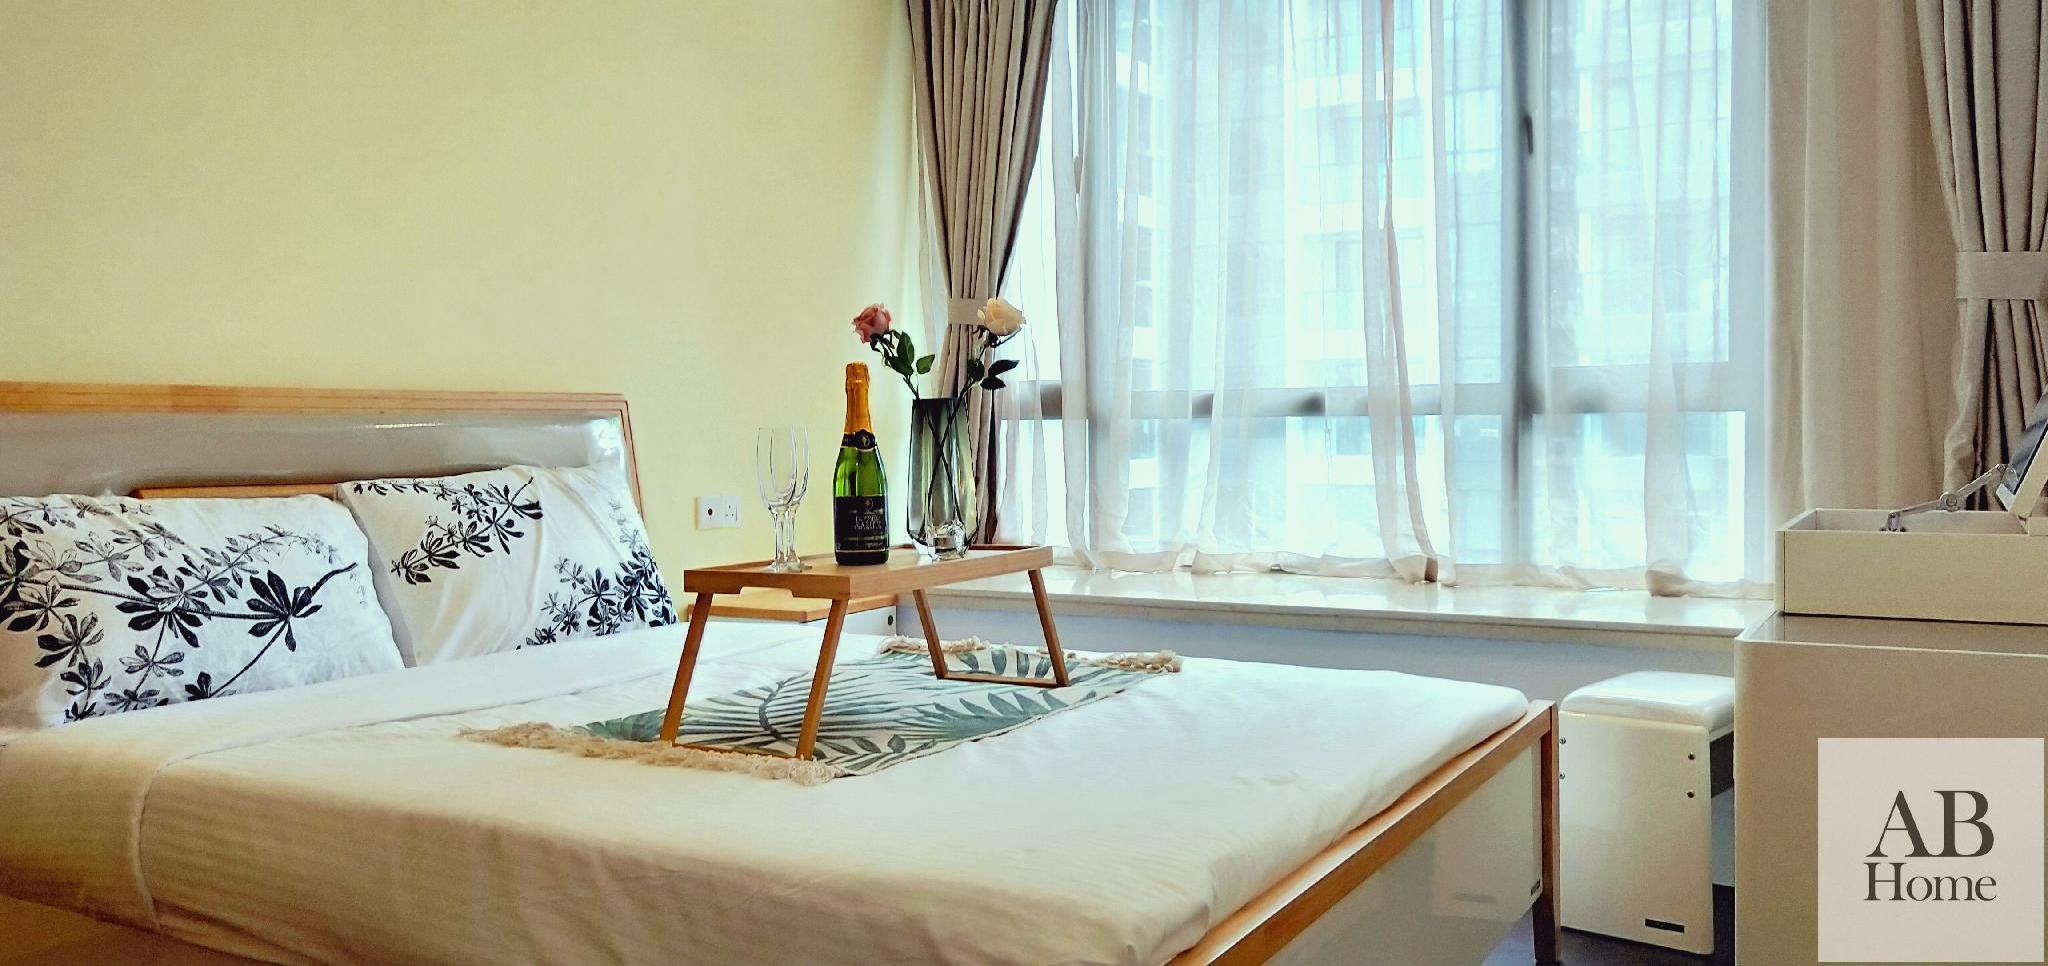 AB Home [Vienna Suite] R&F SHOPPING MALL JB